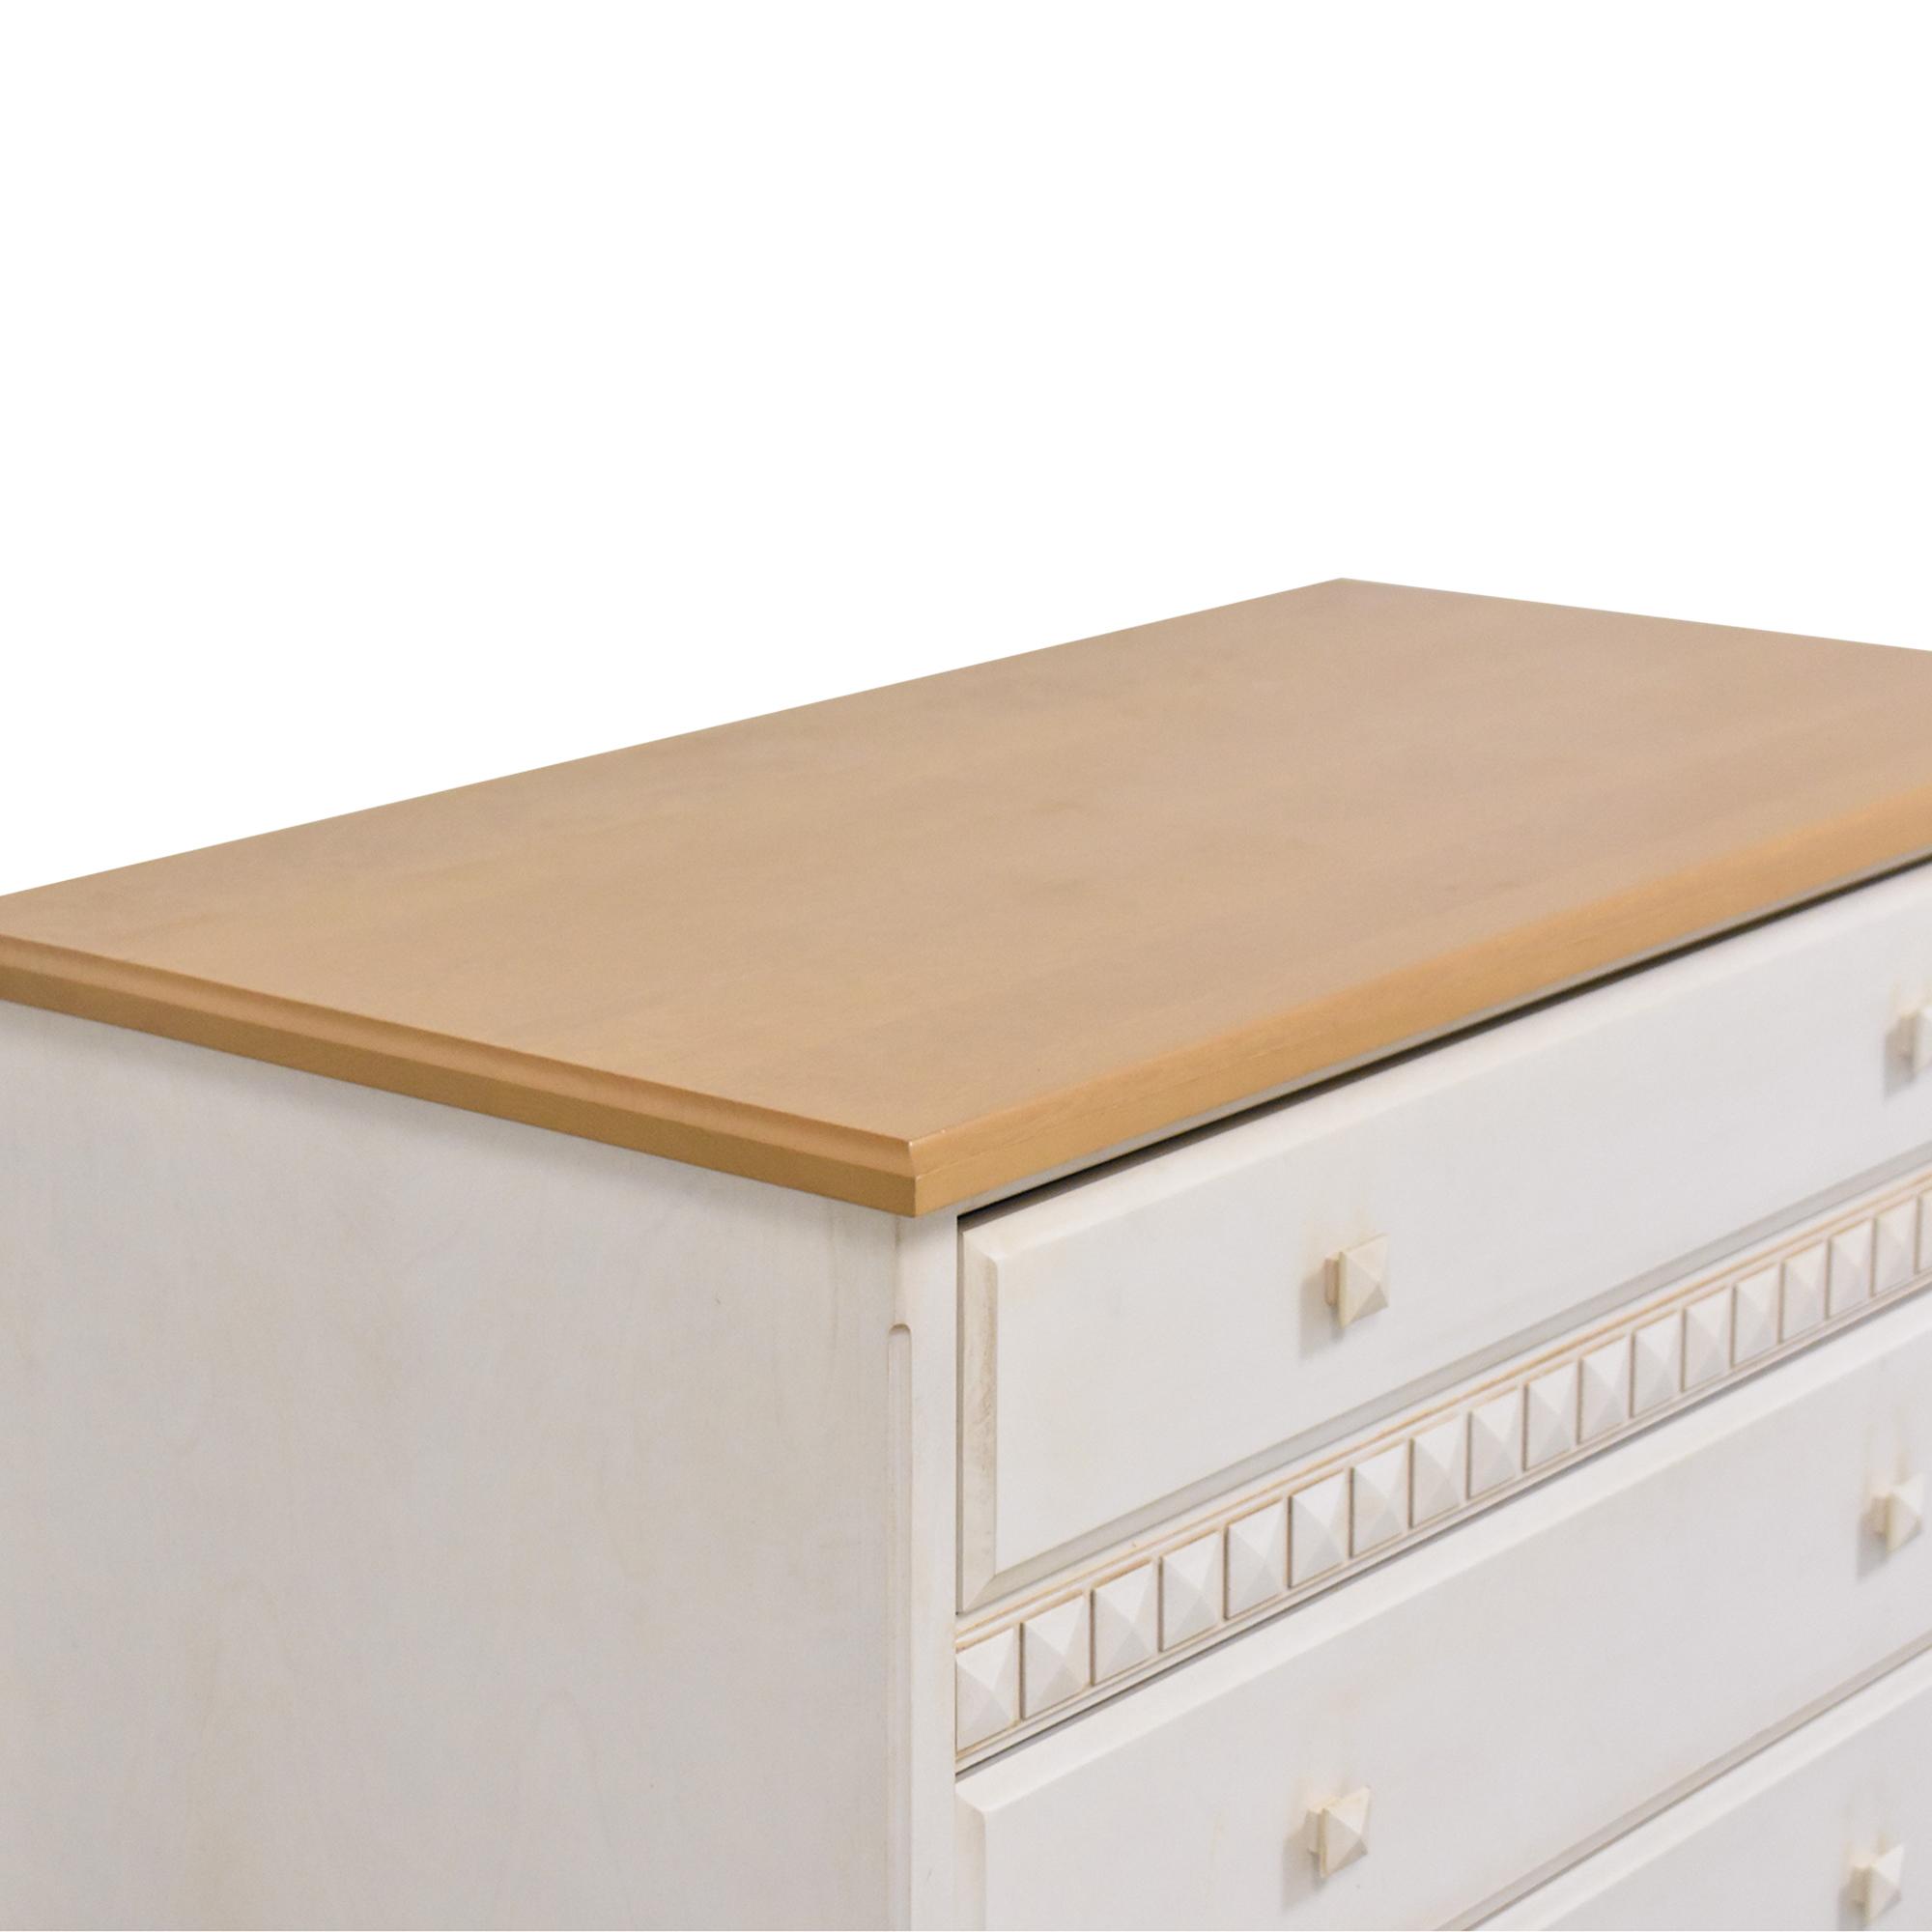 Morigeau-Lepine Morigeau-Lepine Three Drawer Dresser pa